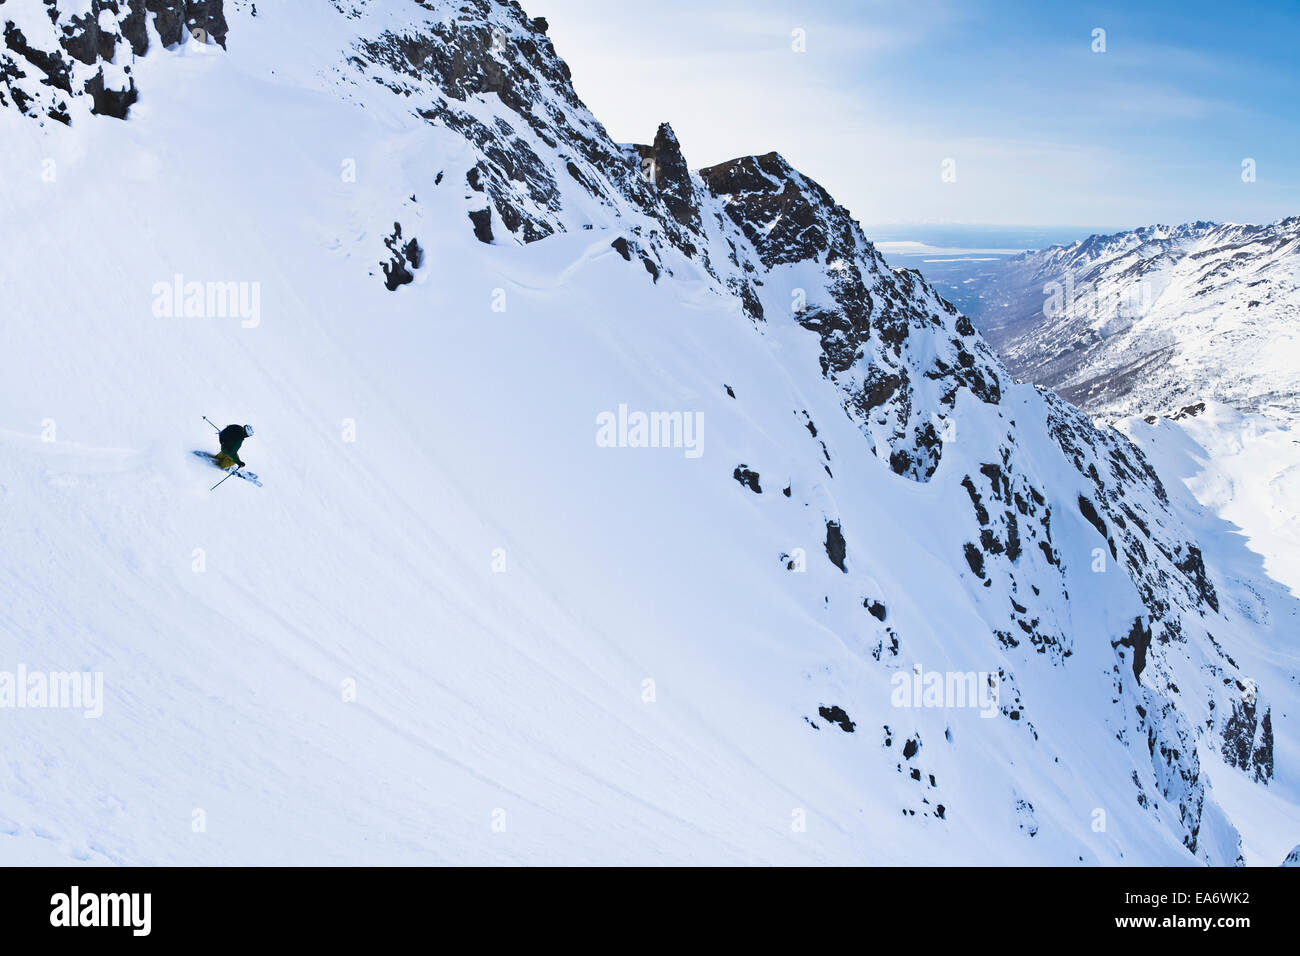 Backcountry ski mountaineering near Eagle River, Western Chugach Mountains, Southcentral Alaska; Alaska, USA - Stock Image